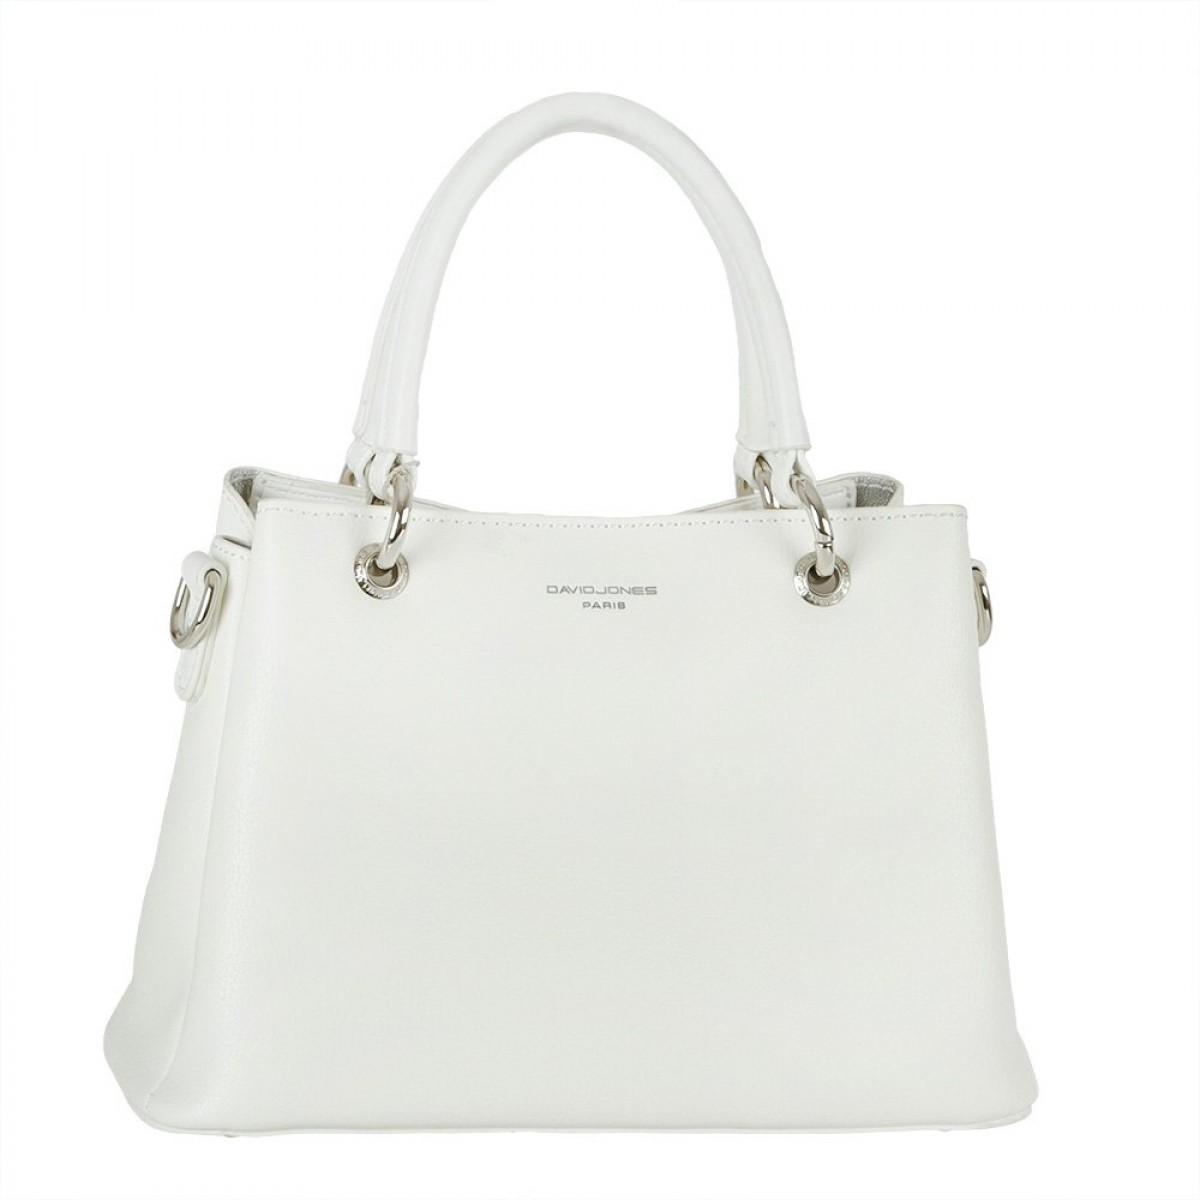 Жіноча сумка David Jones CM5682 WHITE